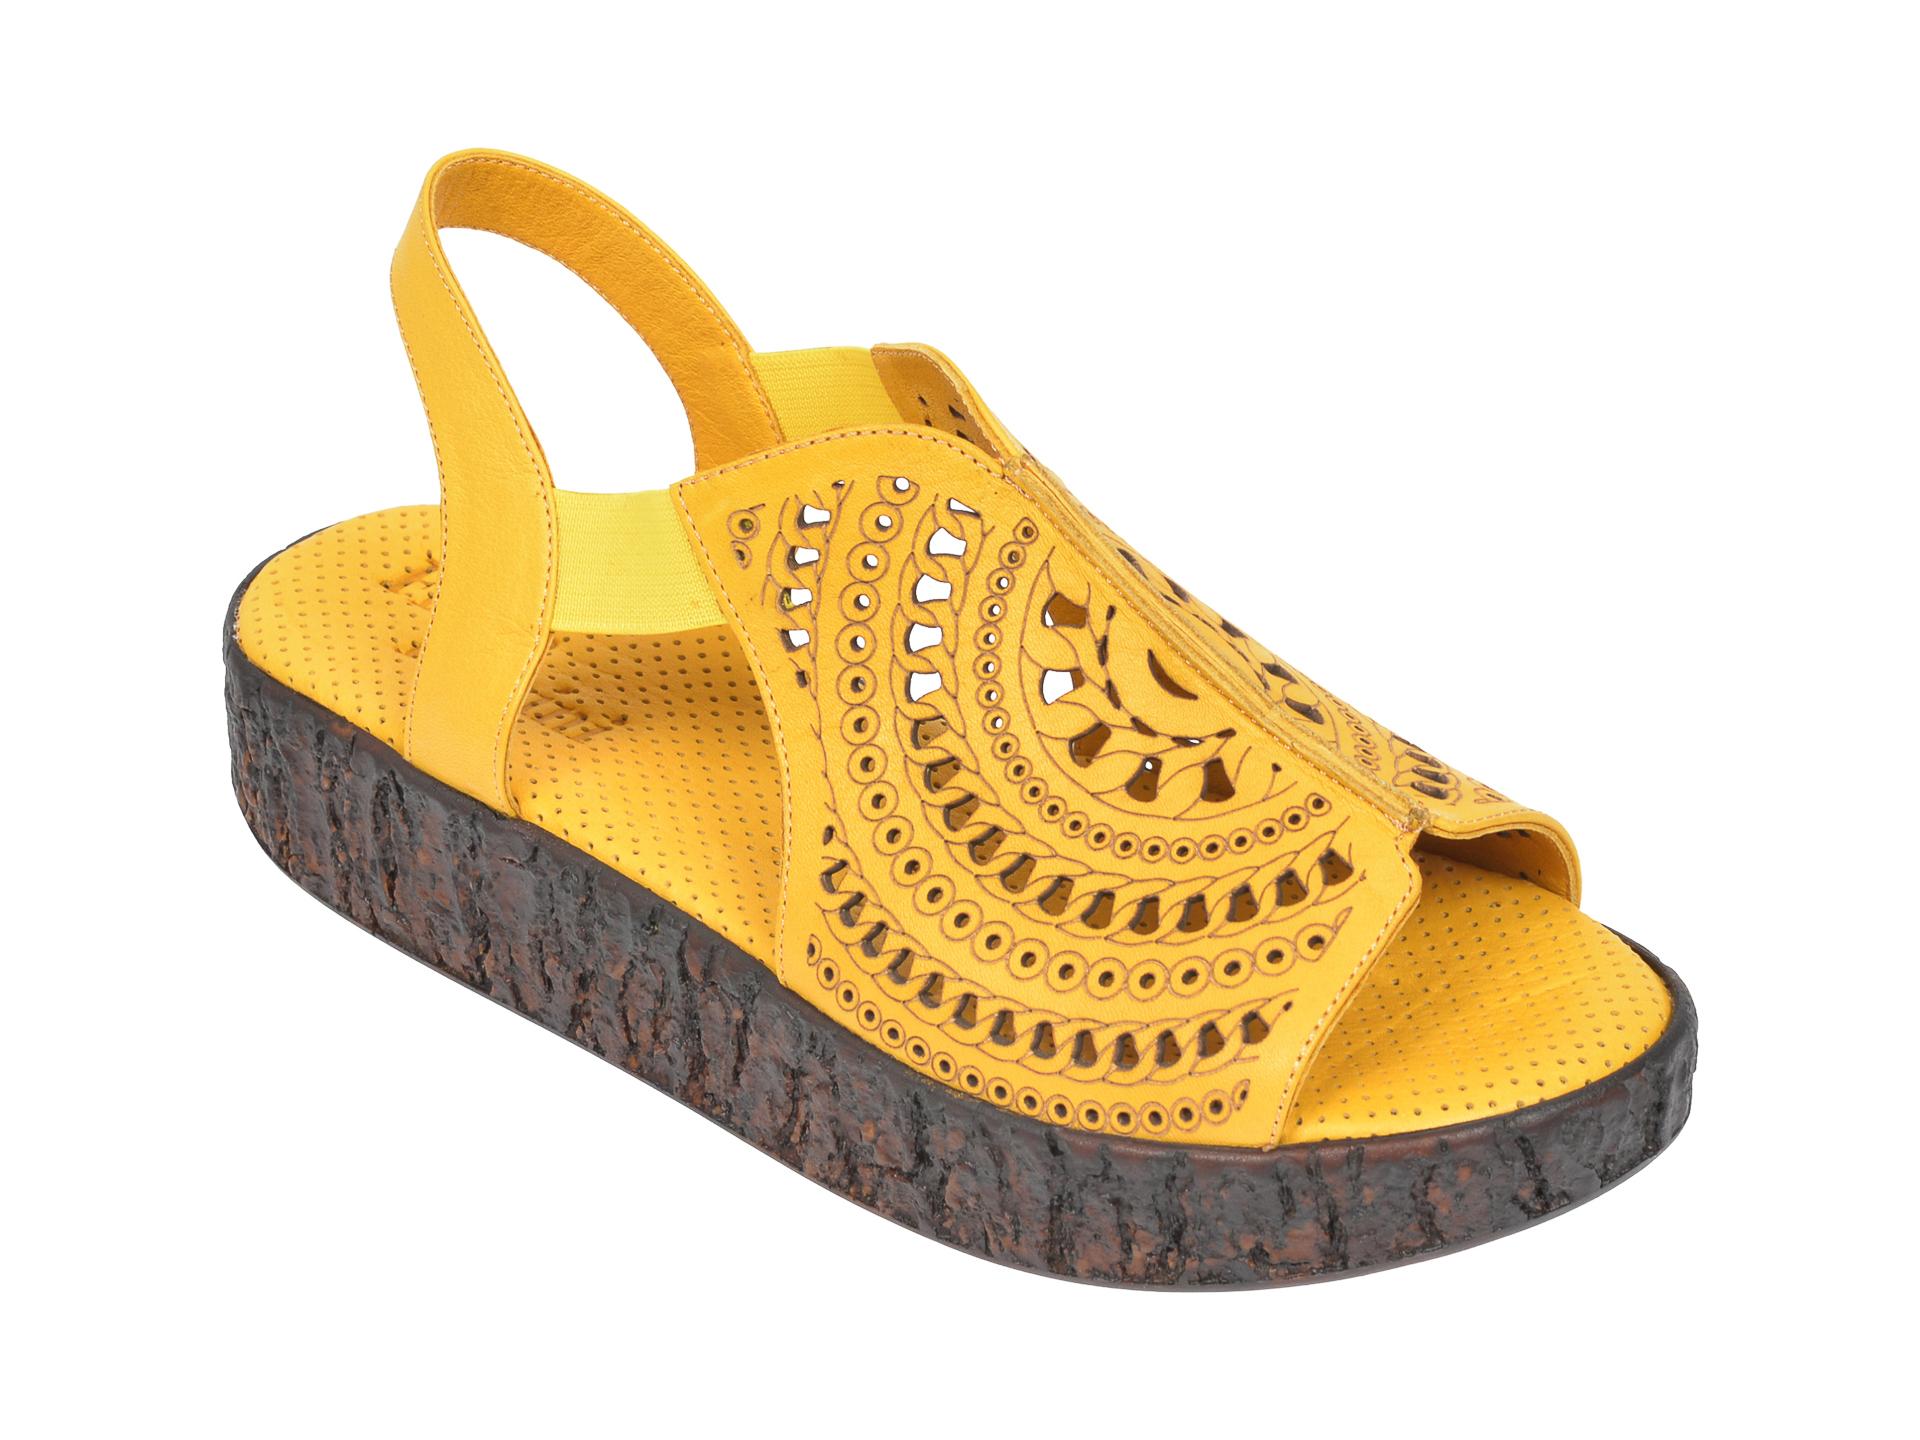 Sandale FLAVIA PASSINI galbene, 2100, din piele naturala